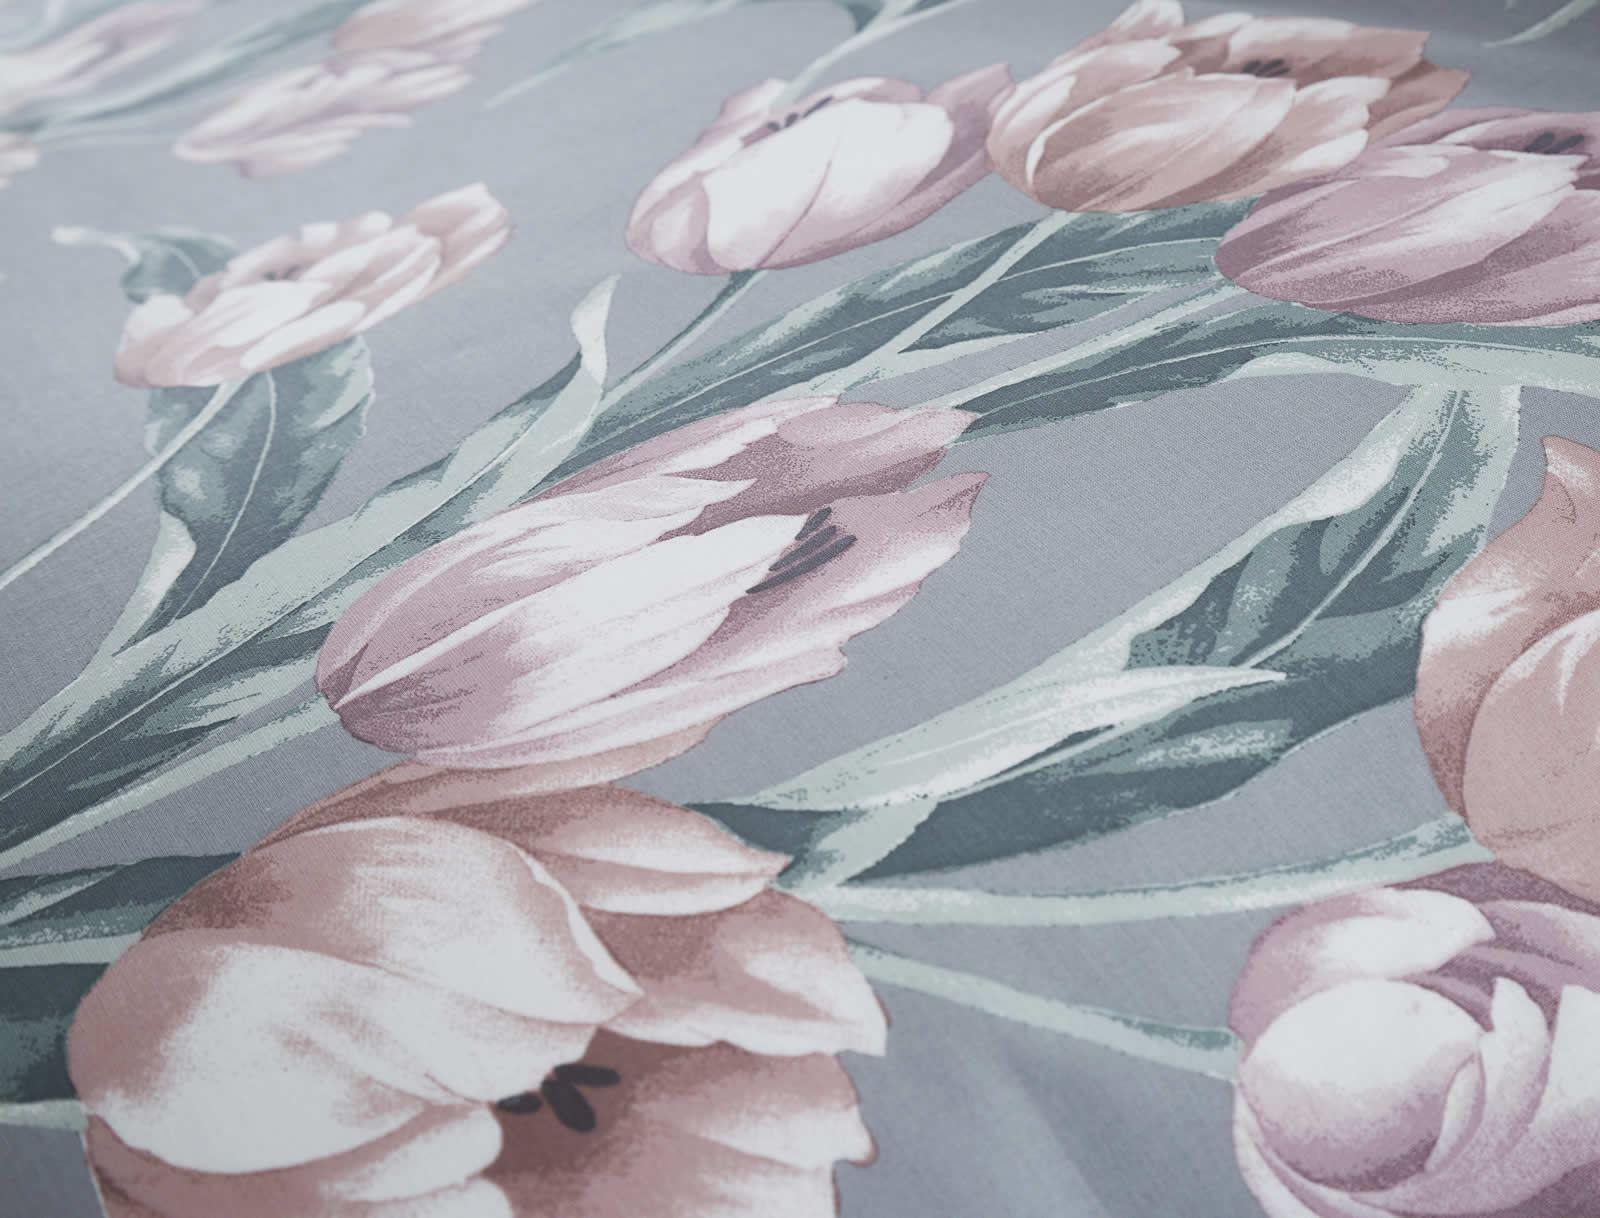 Cubierta-Edredon-Rosa-Blush-Rose-Impreso-juego-De-Edredon-Conjuntos-de-Cama-cubre-Jacquard miniatura 48